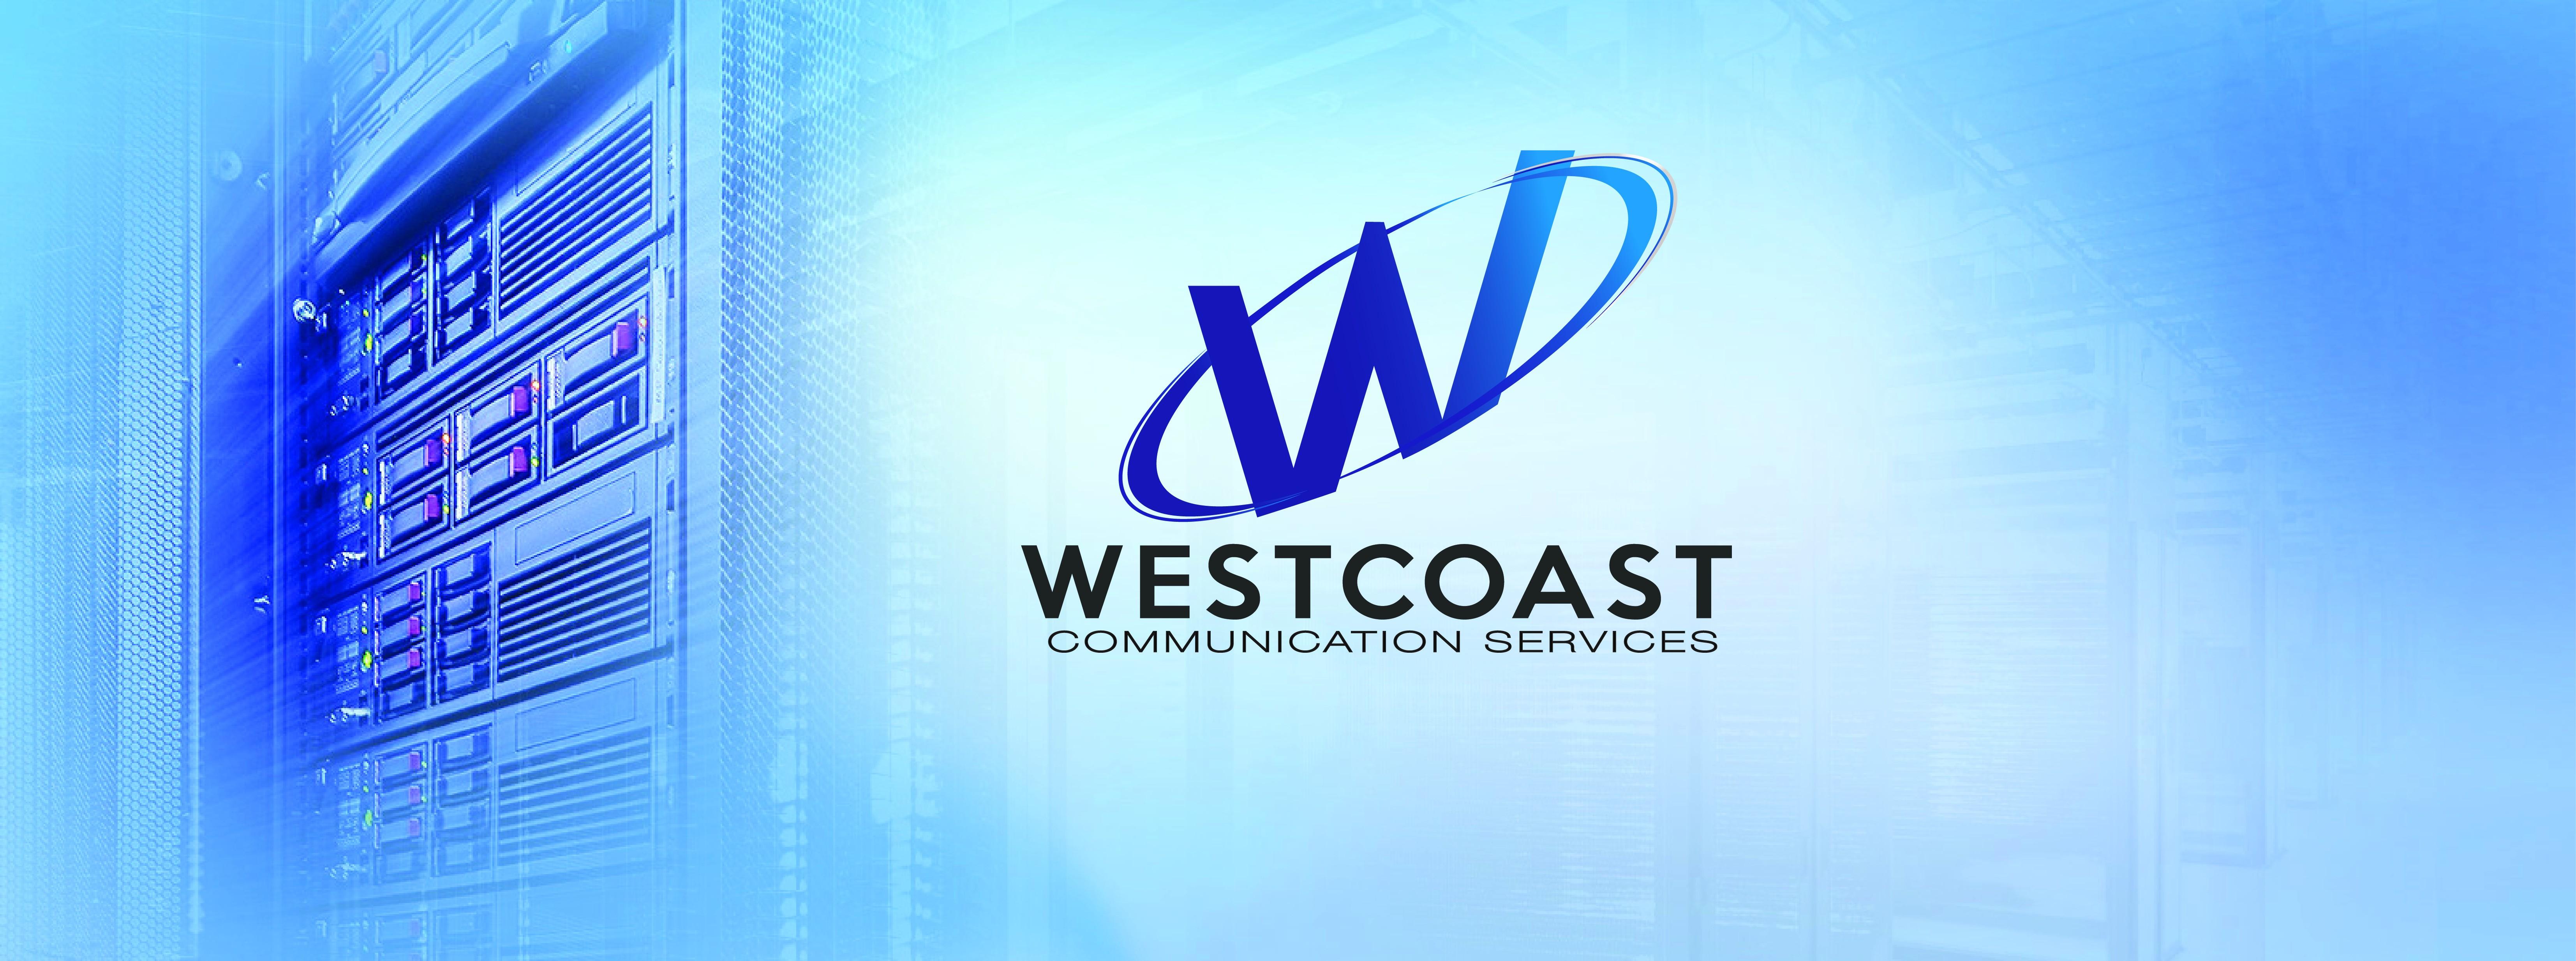 Westcoast Communication Services, Inc  | LinkedIn